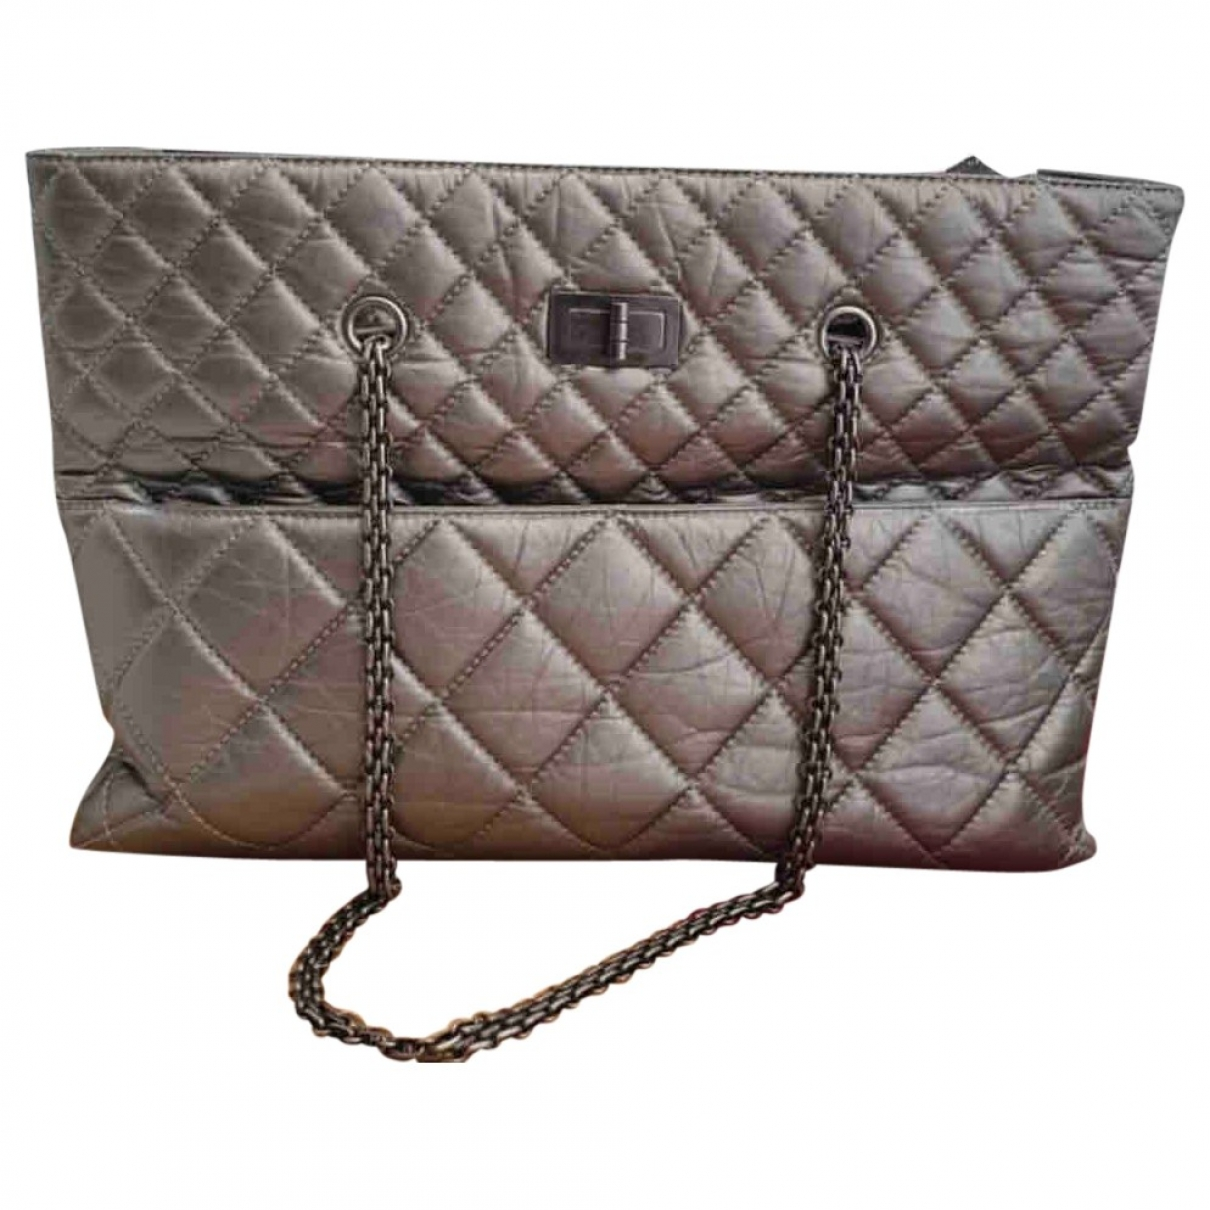 Chanel 2.55 Silver Leather handbag for Women \N